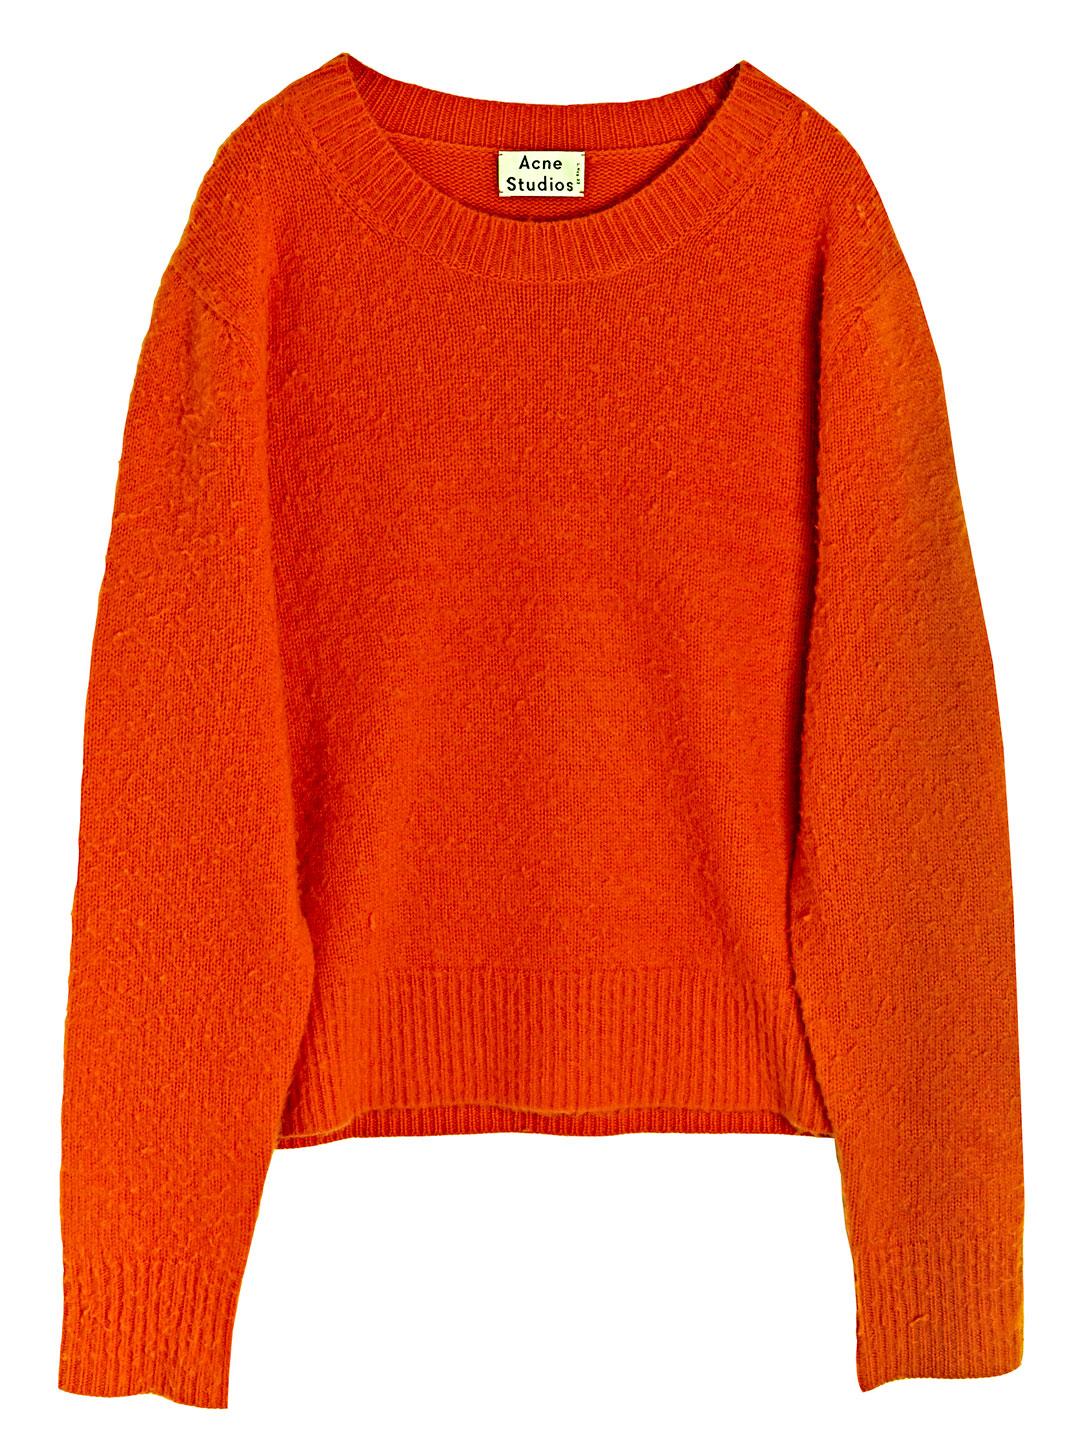 Acne studios Peele Sweater in Orange for Men | Lyst